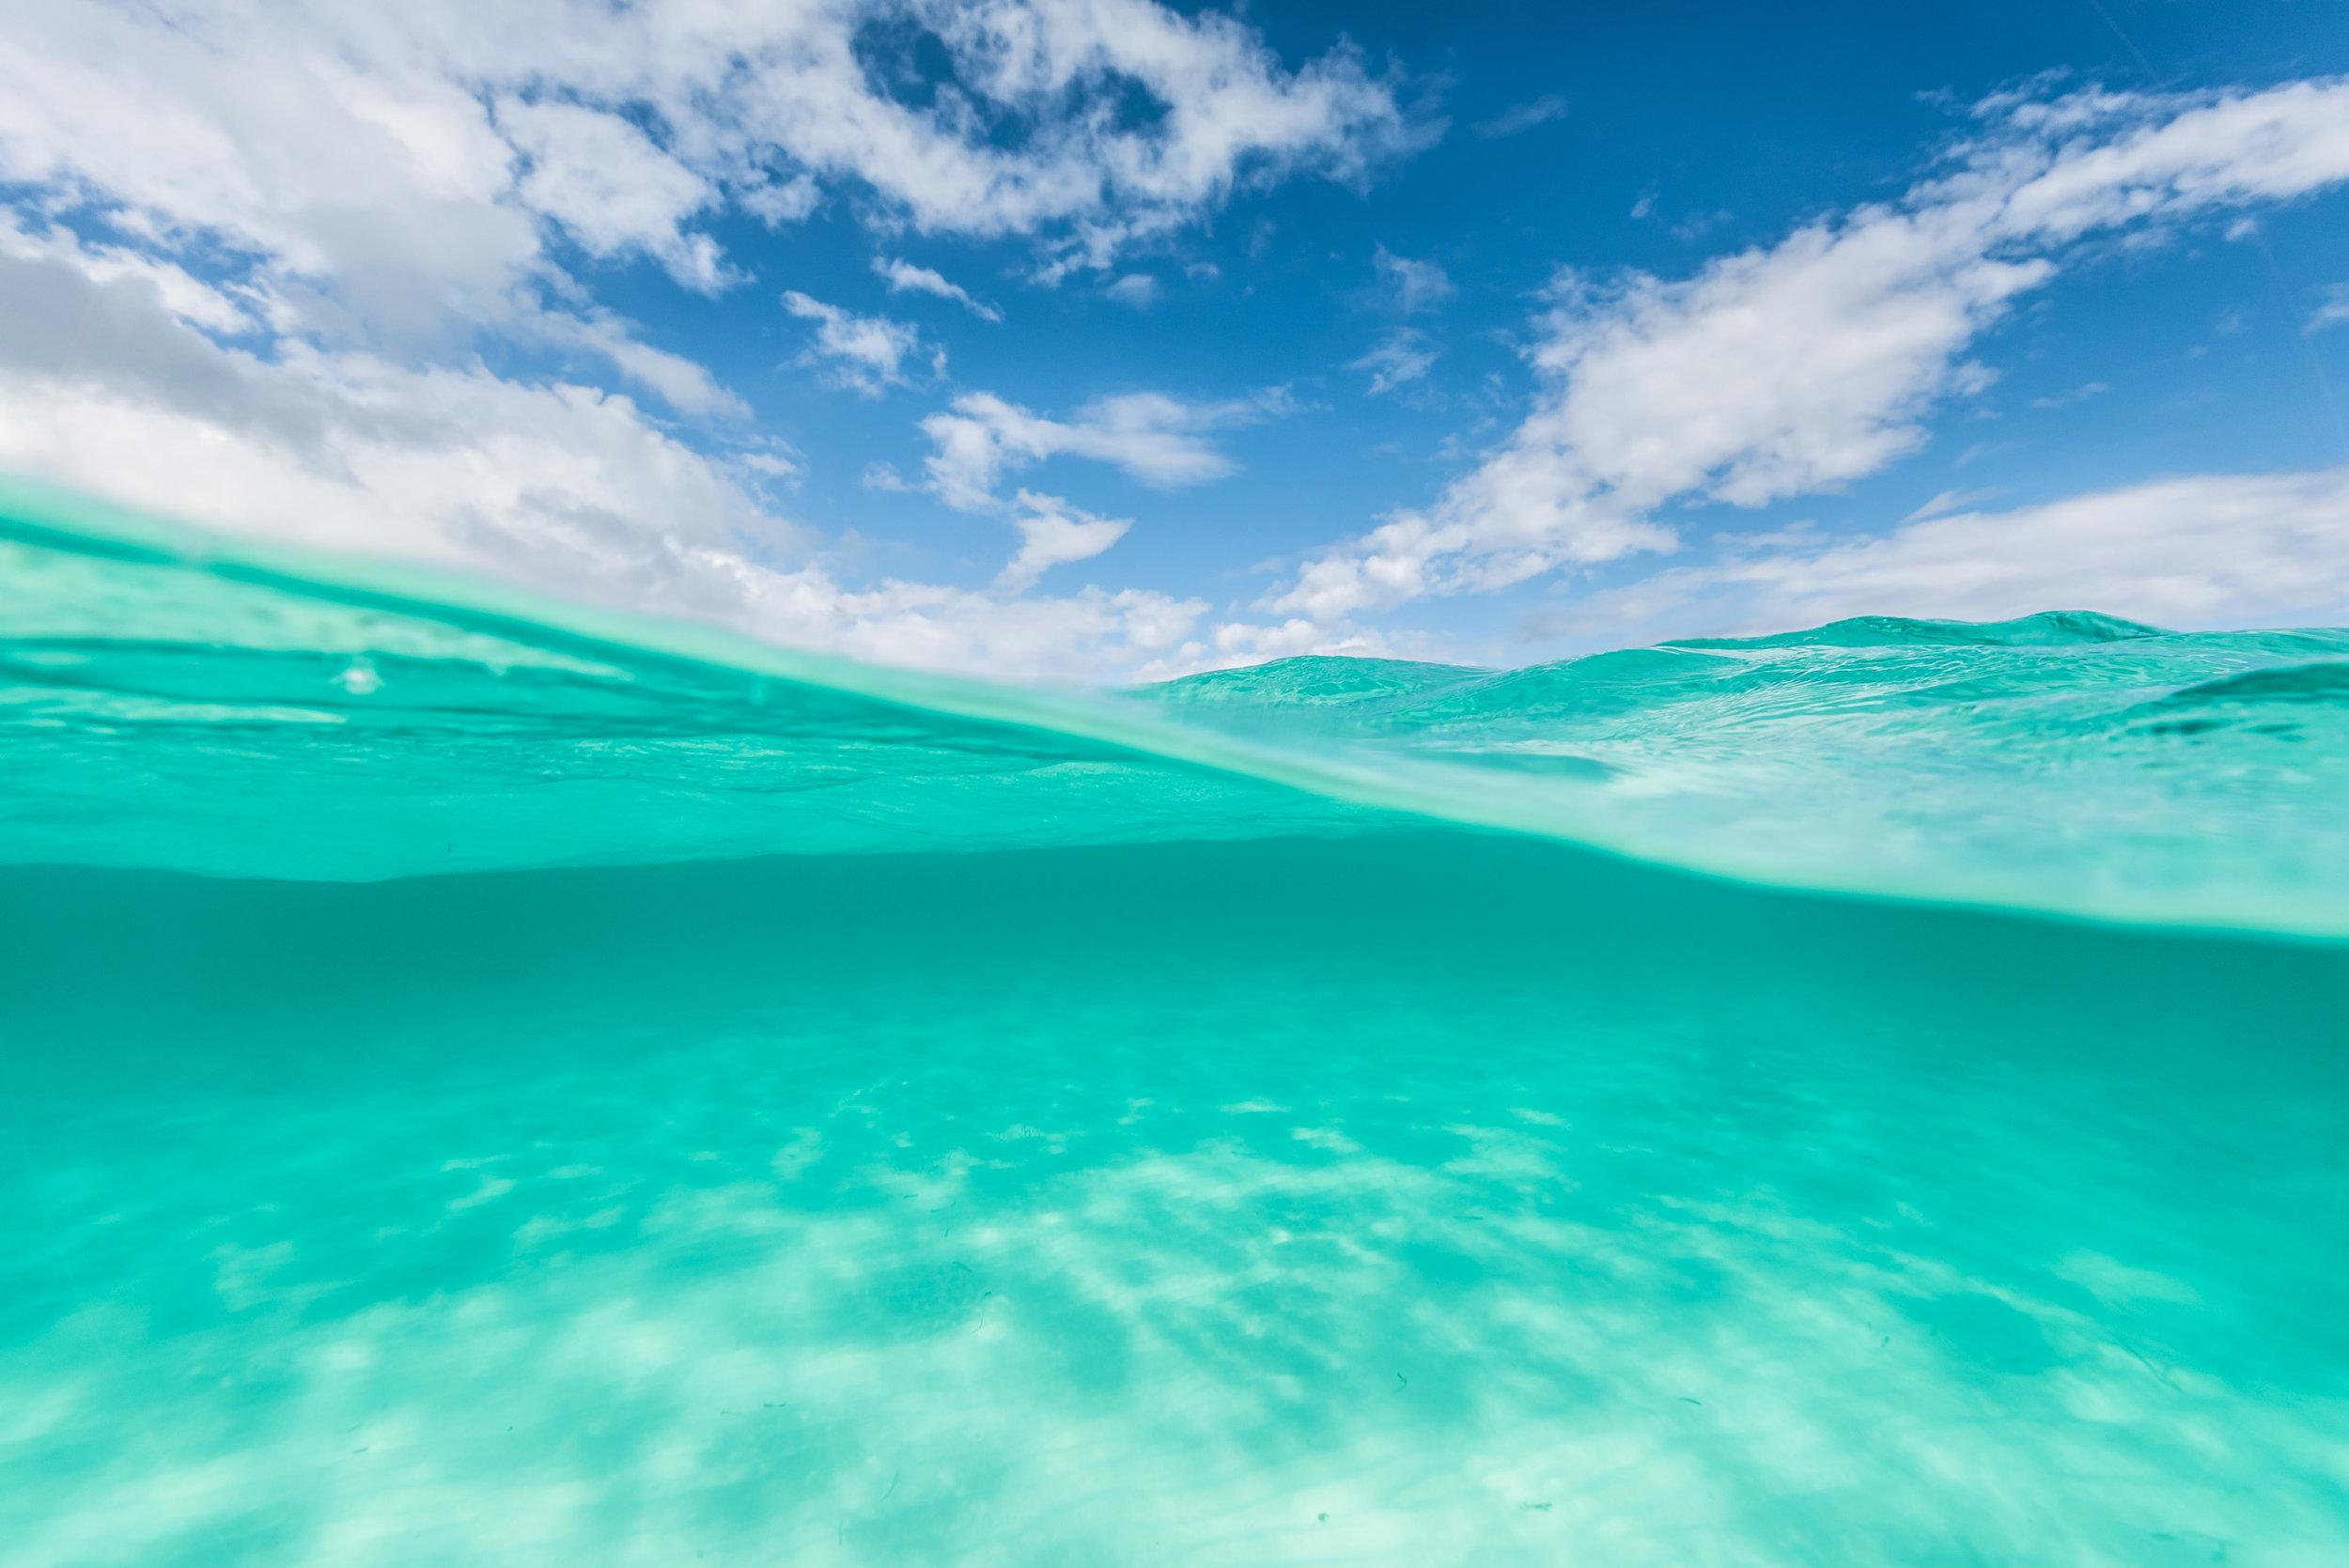 Tropical paradise_tone curve image.jpg